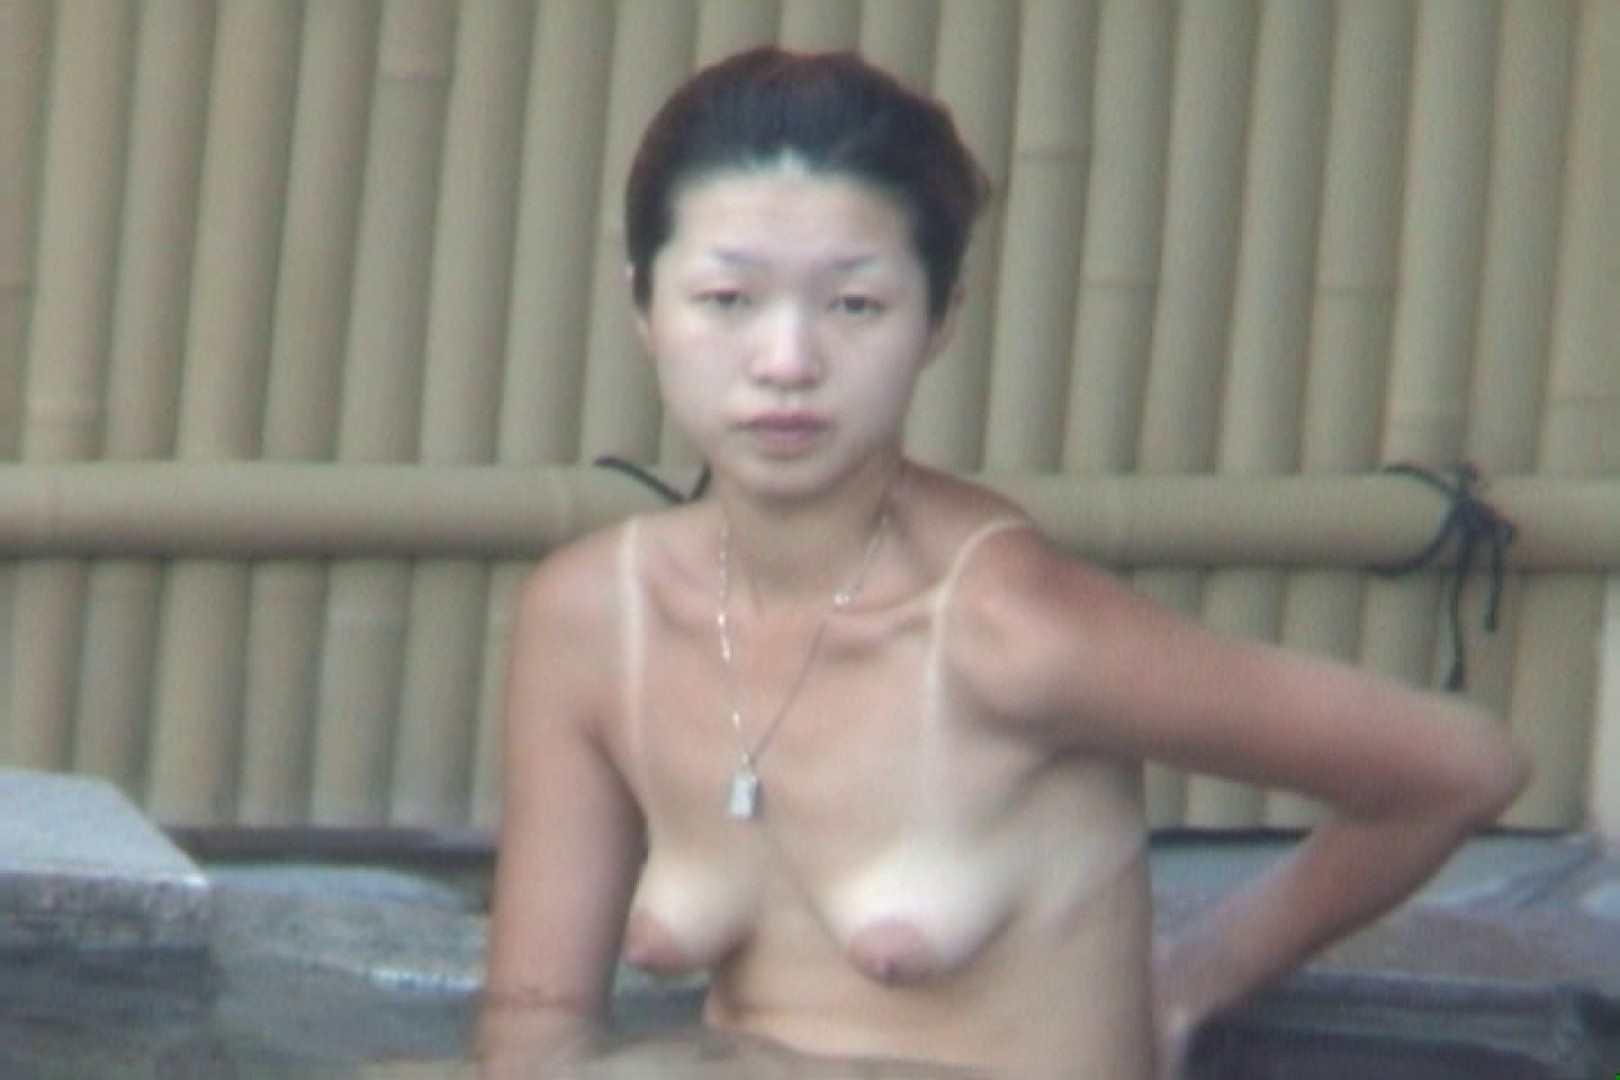 Aquaな露天風呂Vol.571 盗撮 | OLセックス  83画像 55